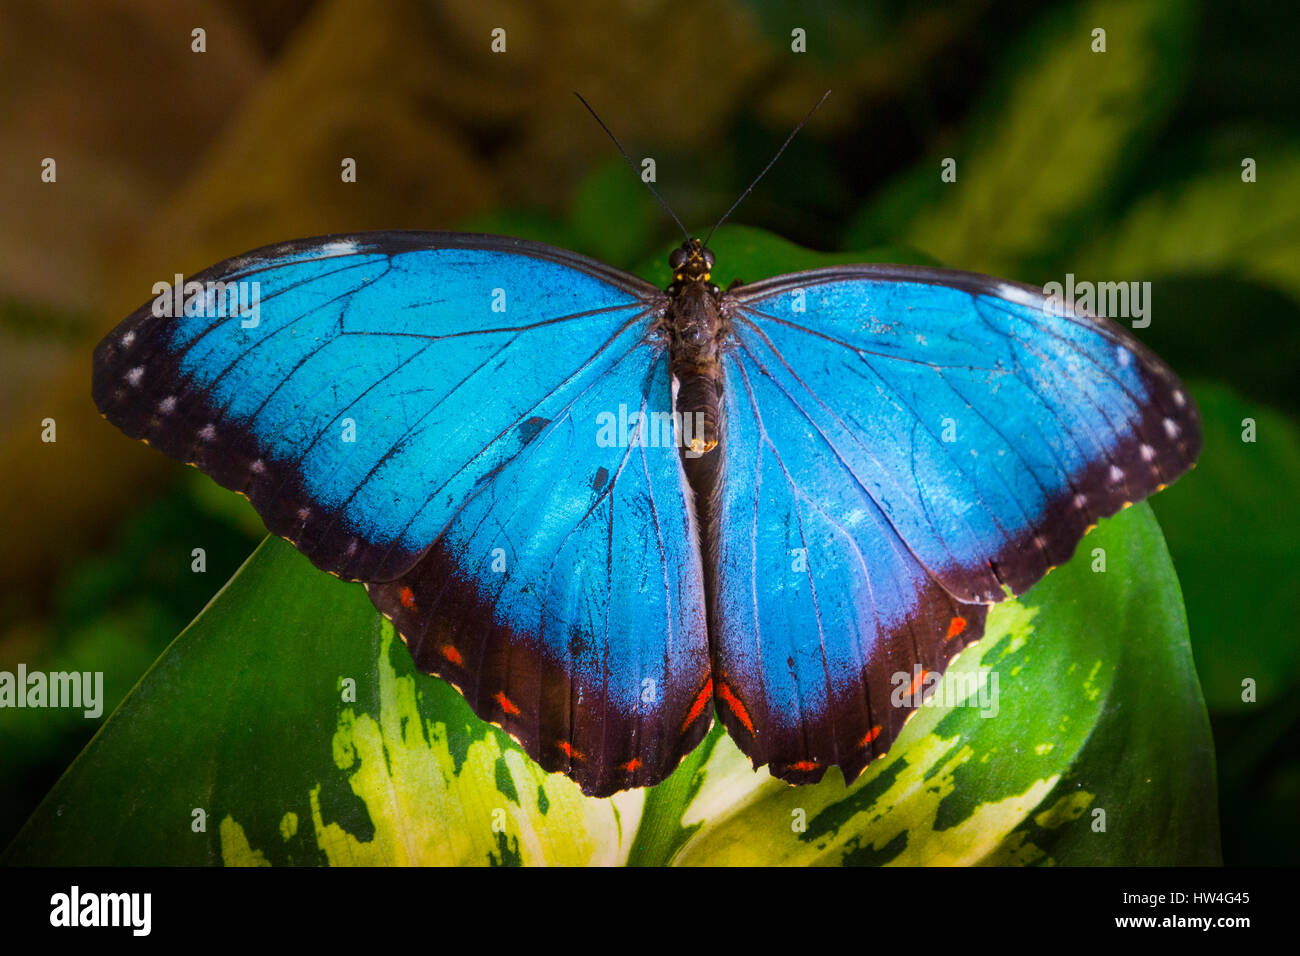 Blaue morpho Butterfly entspannen auf ein Blatt. Benalmadena Butterfly Park, Costa del Sol, Malaga, Spanien Europa Stockbild